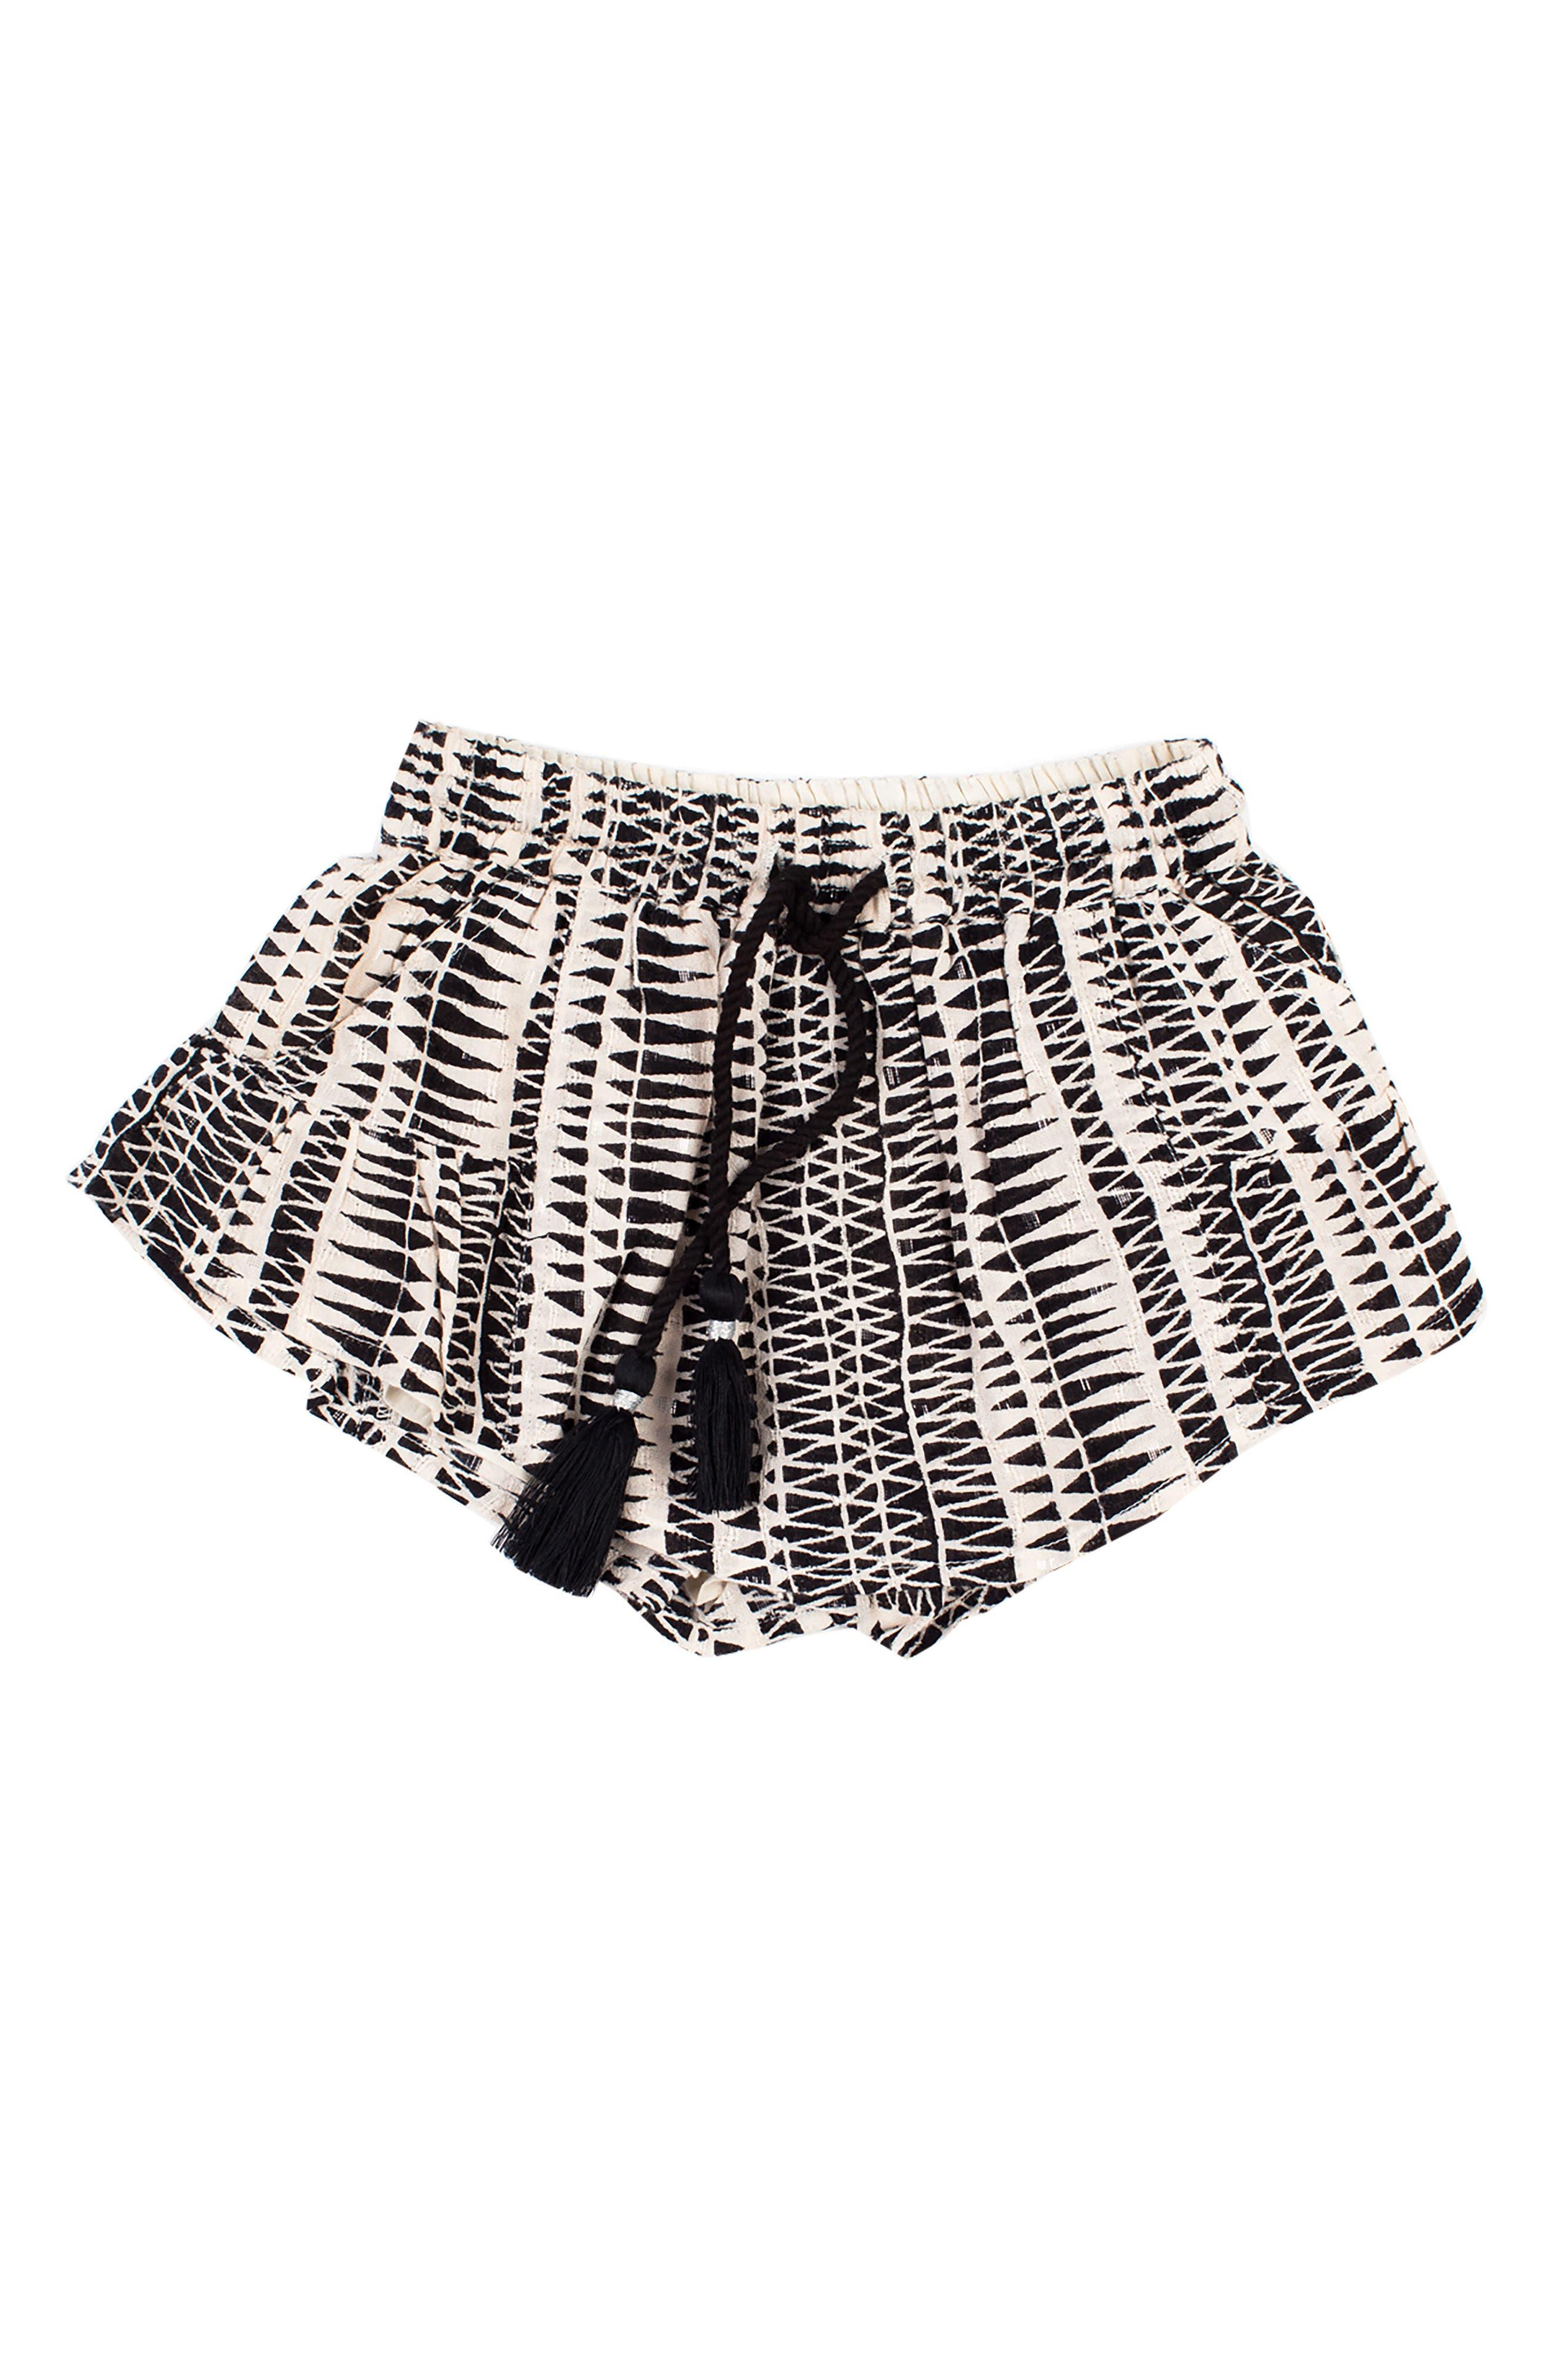 Little Dipper Print Shorts,                         Main,                         color, BLACK